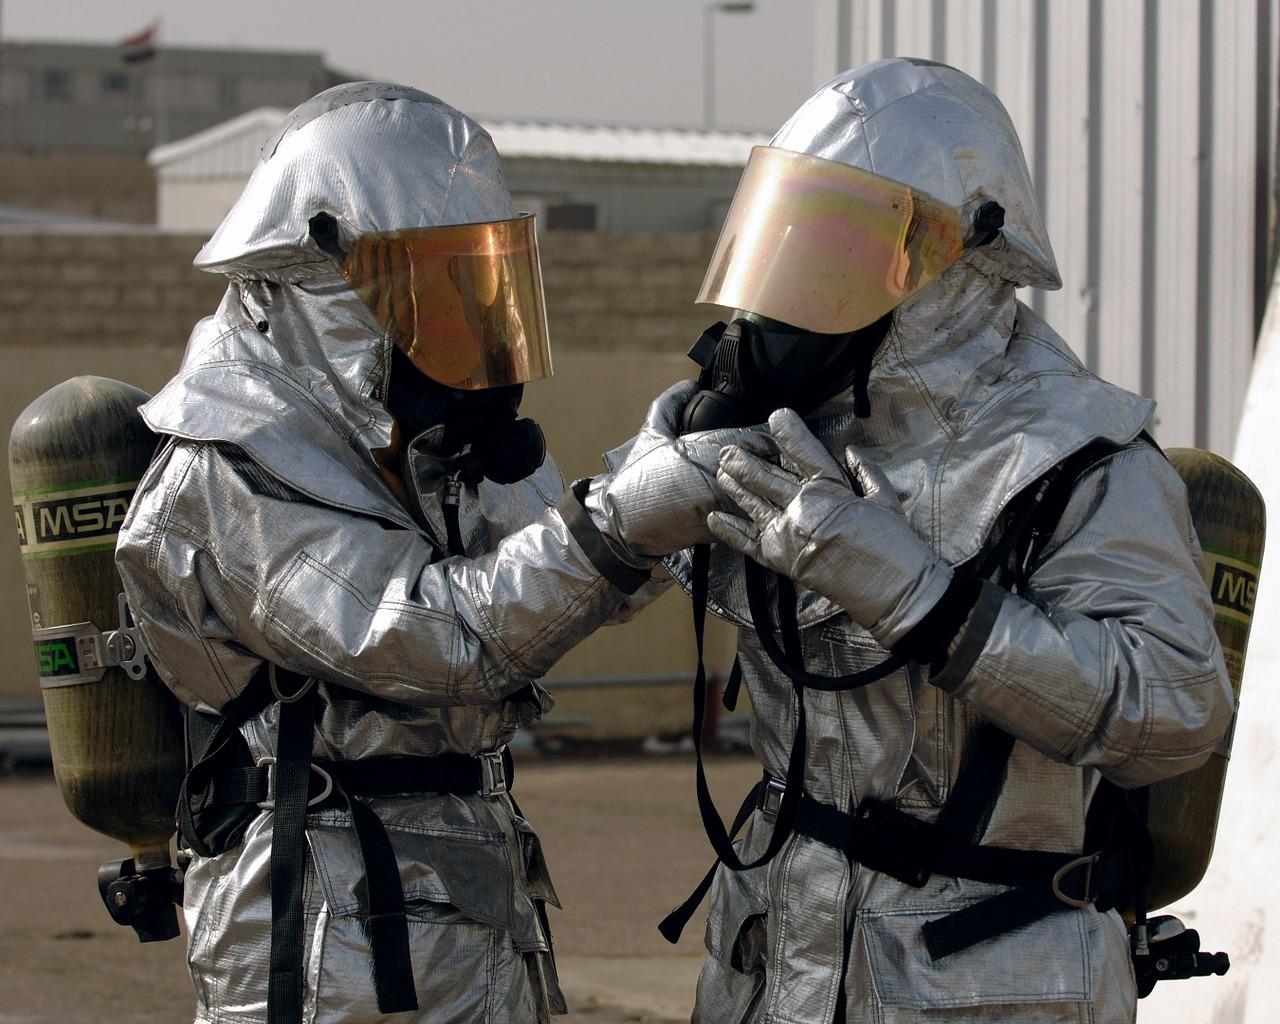 asbestos-removal-1.jpg